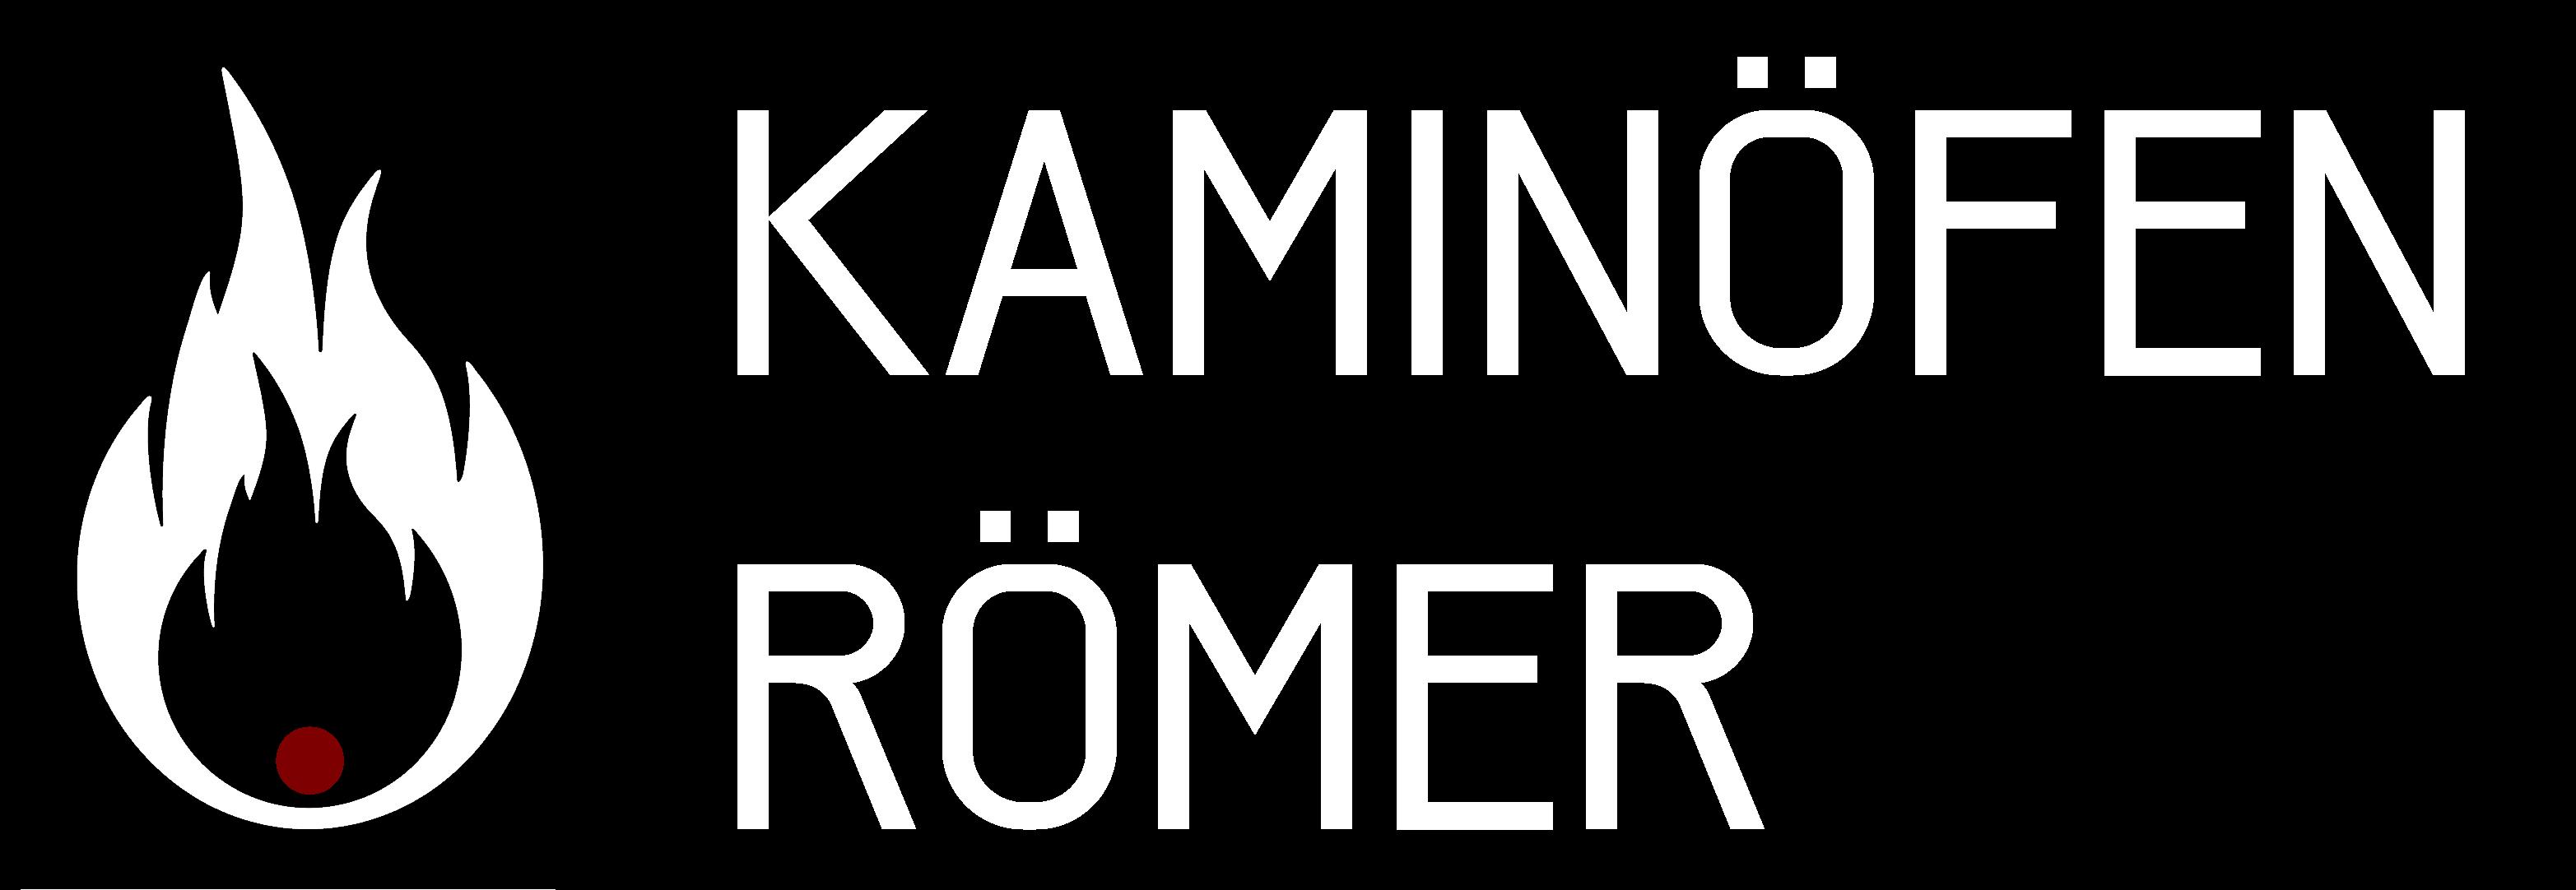 Kaminöfen Römer logo